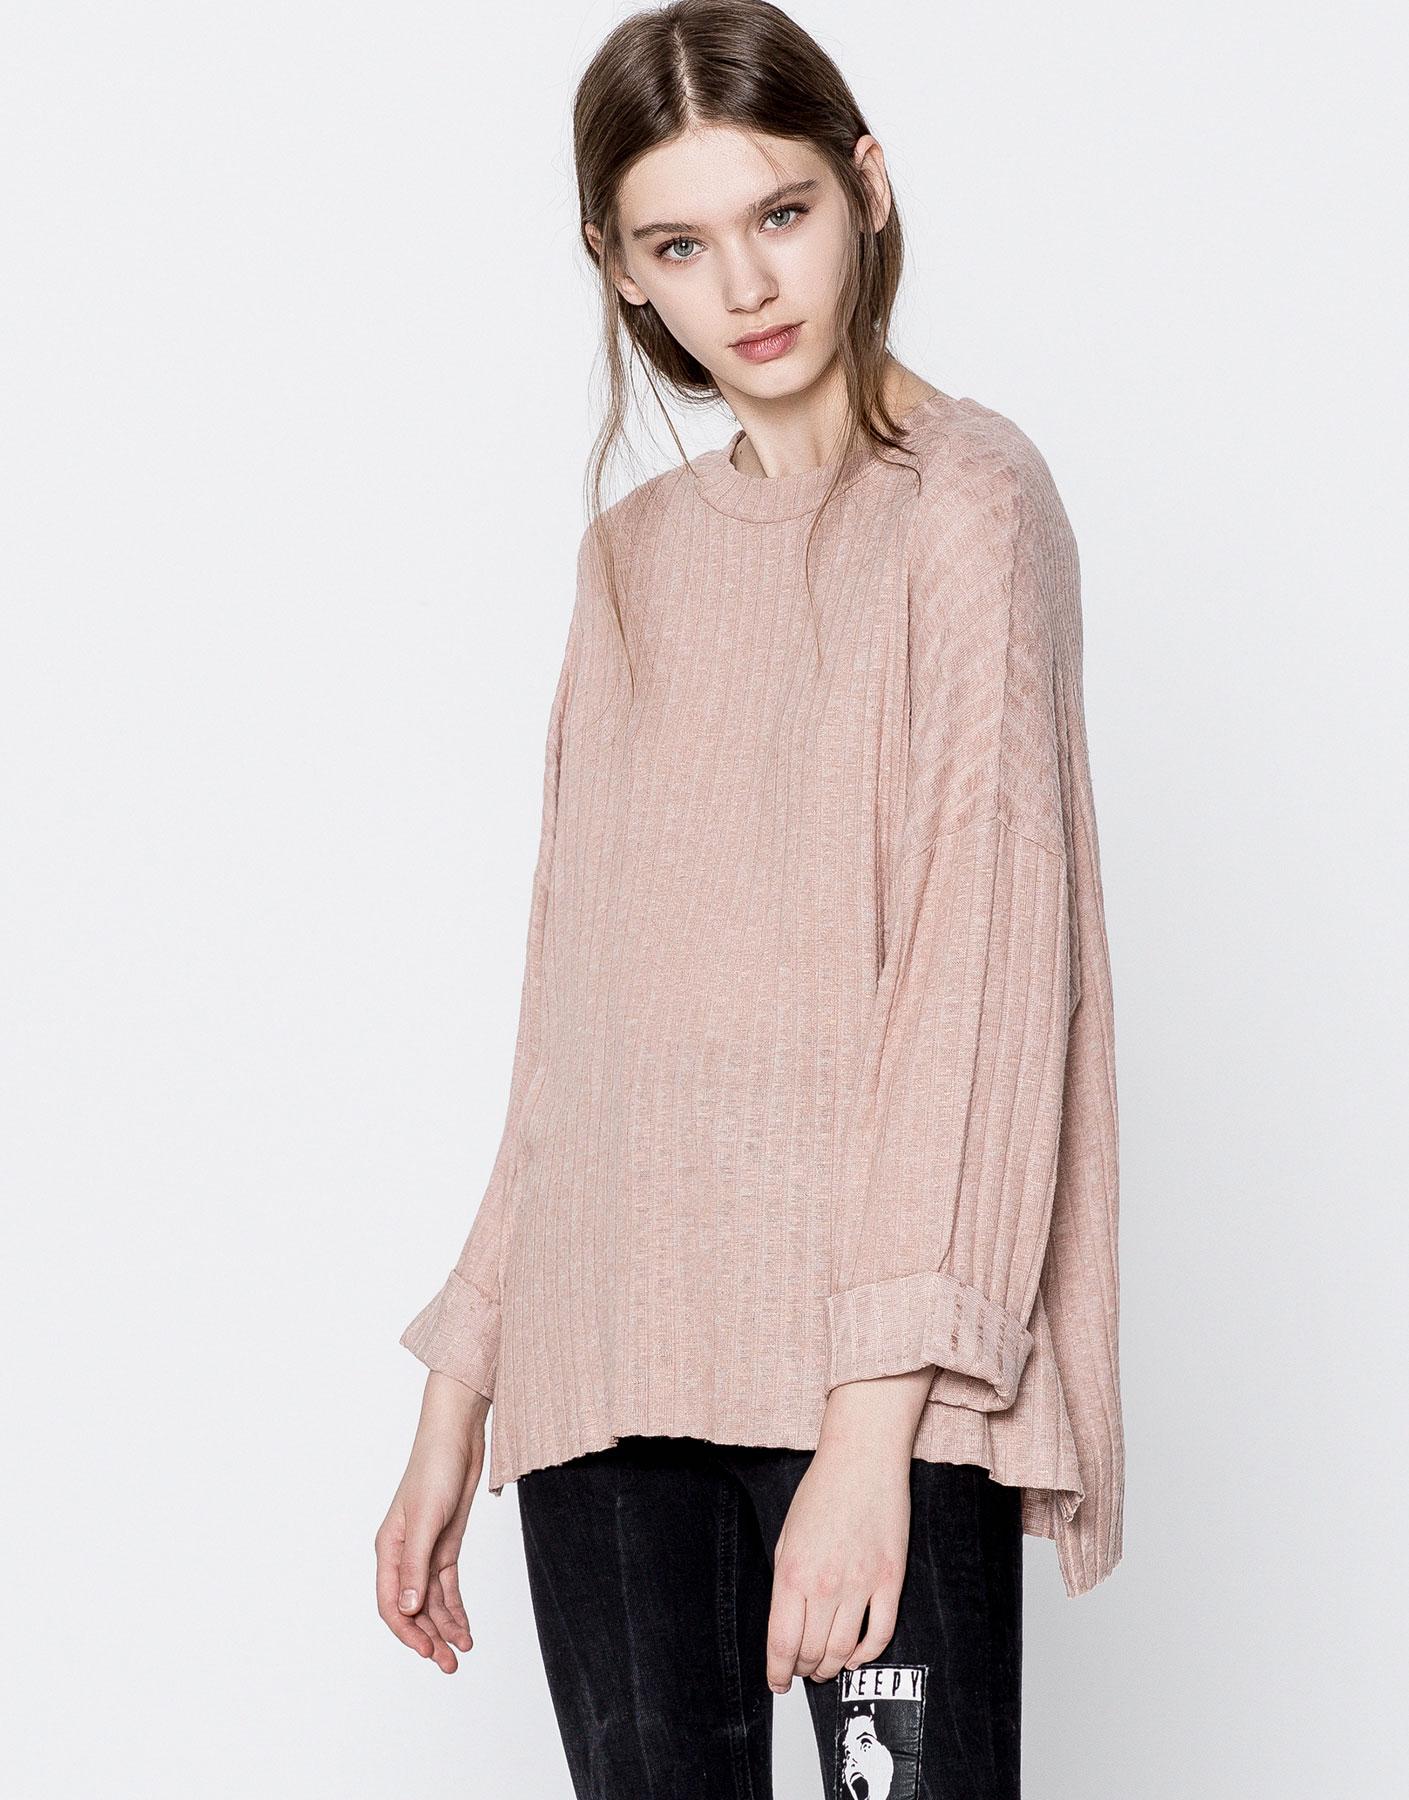 Ribbed oversized sweater